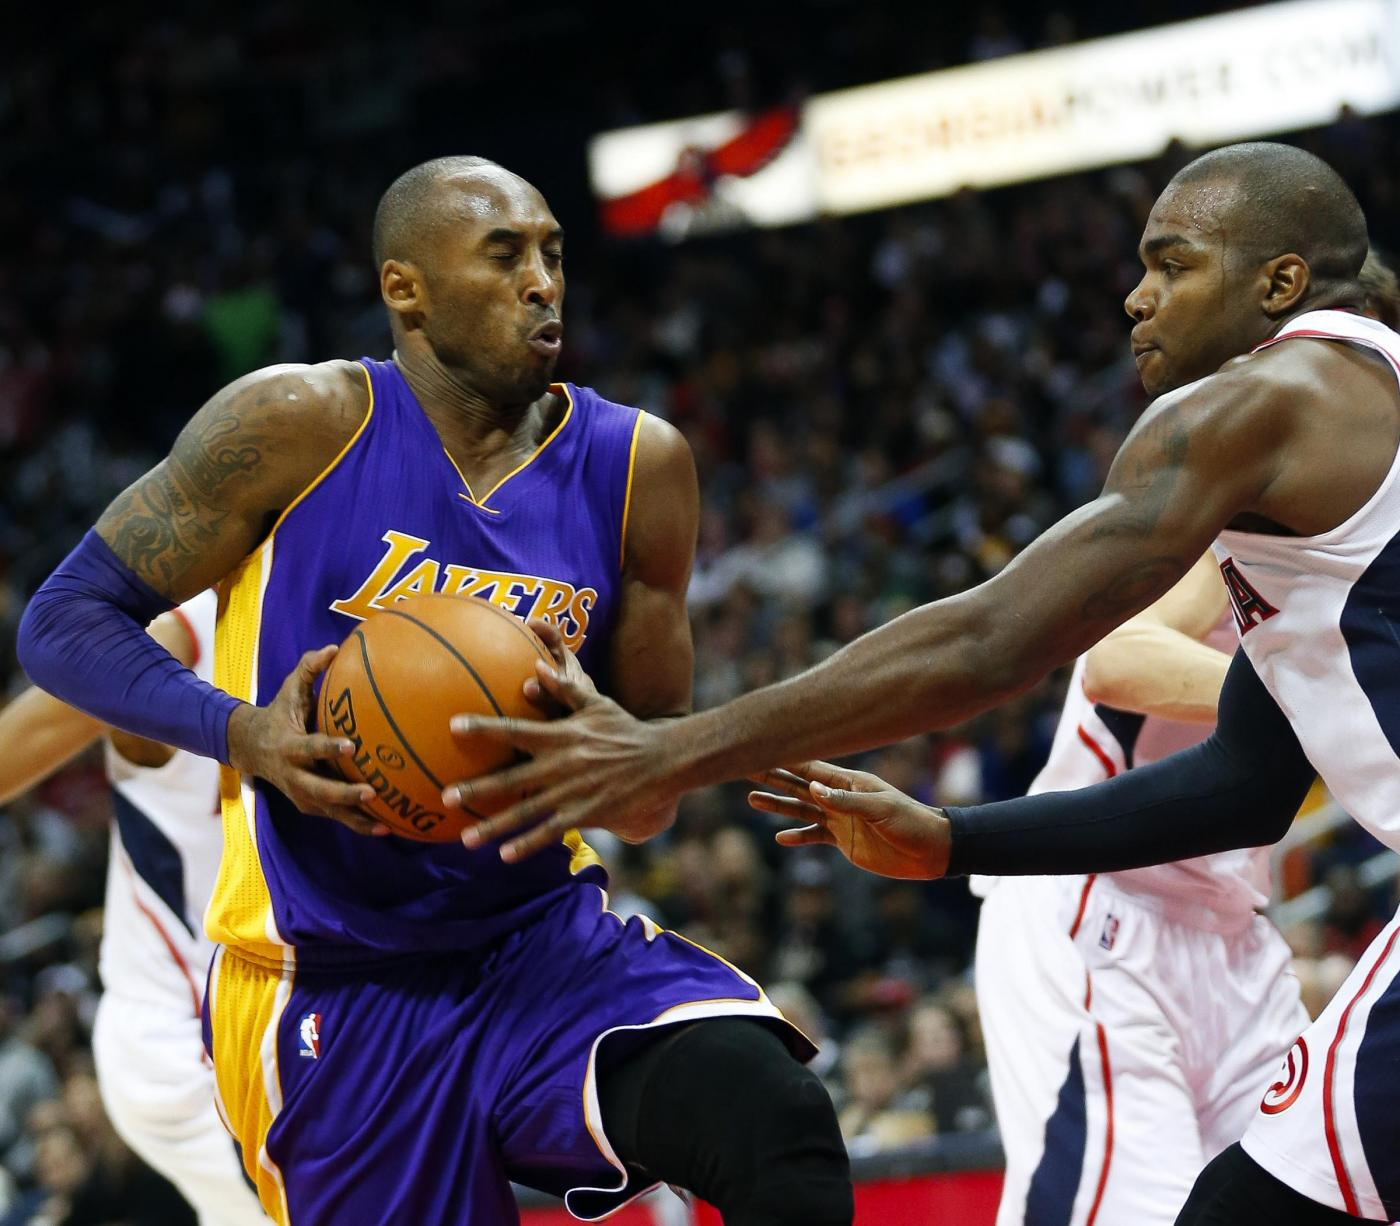 Basket, Kobe Bryant nella storia: supera Michael Jordan nei punti totali NBA